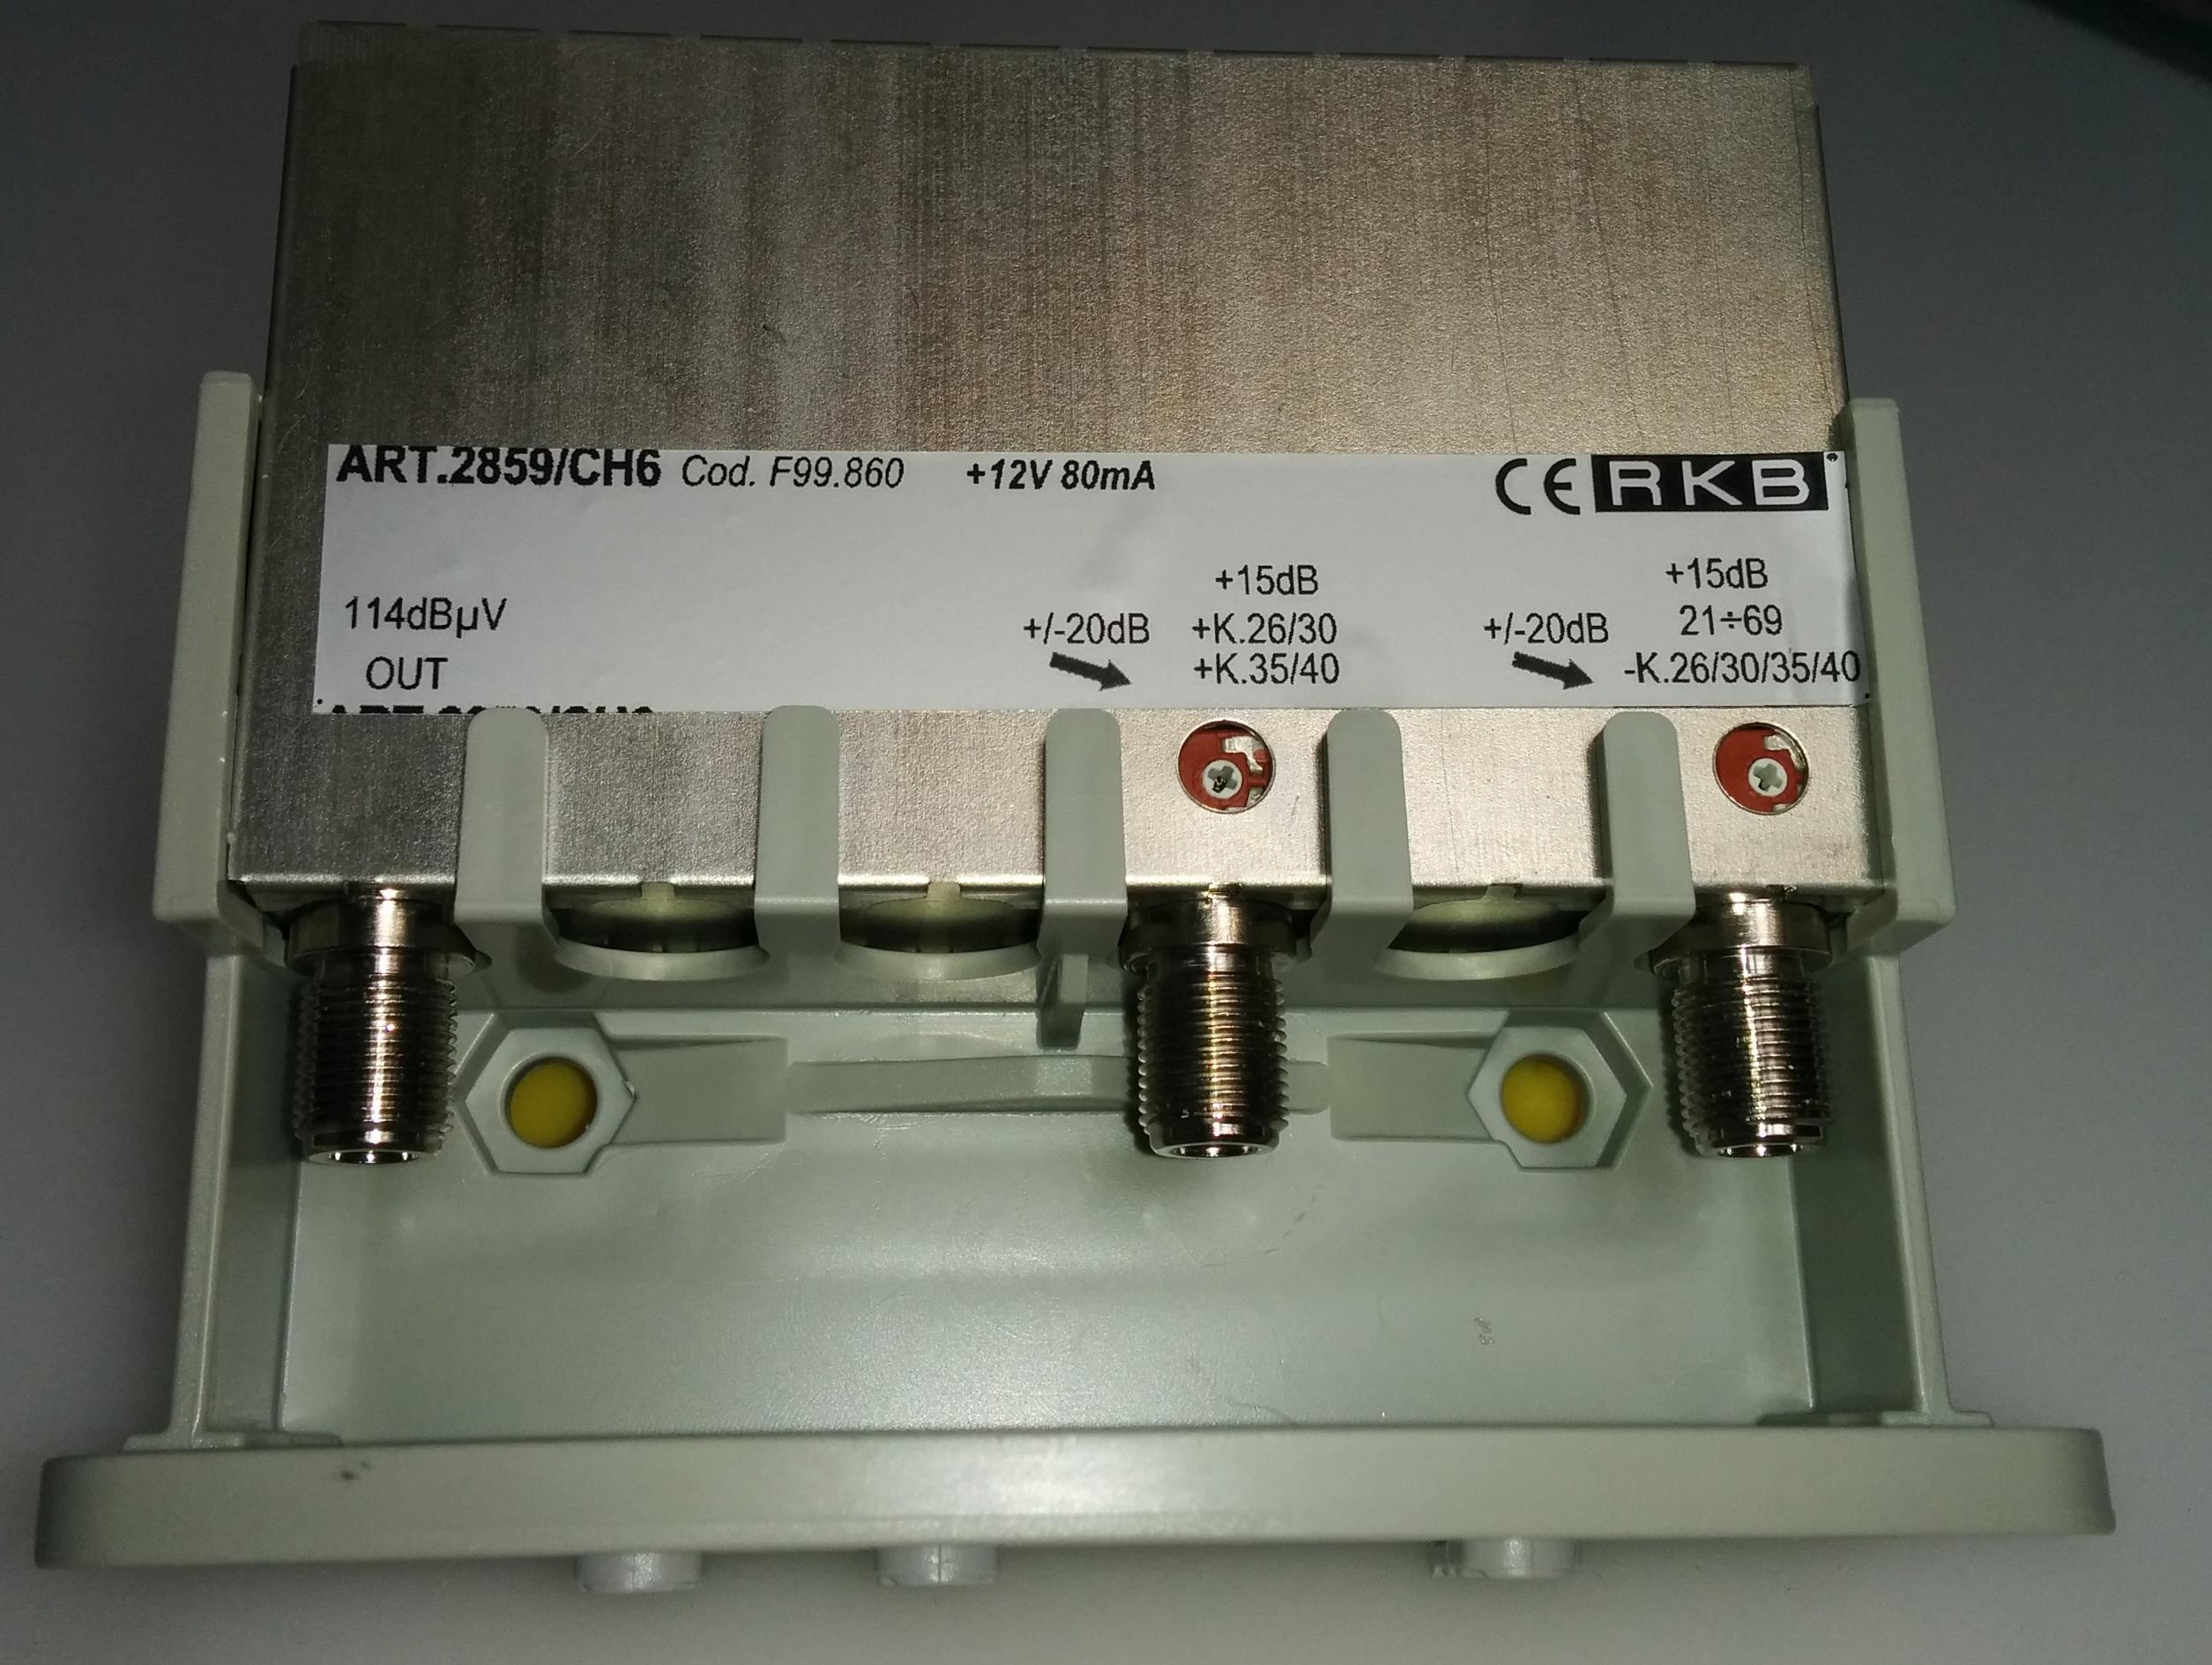 Amplificatore x 4 Mux Rai 26,30,35,40 15dB UHF-K/K 114dBuV 80mA 2859CH6